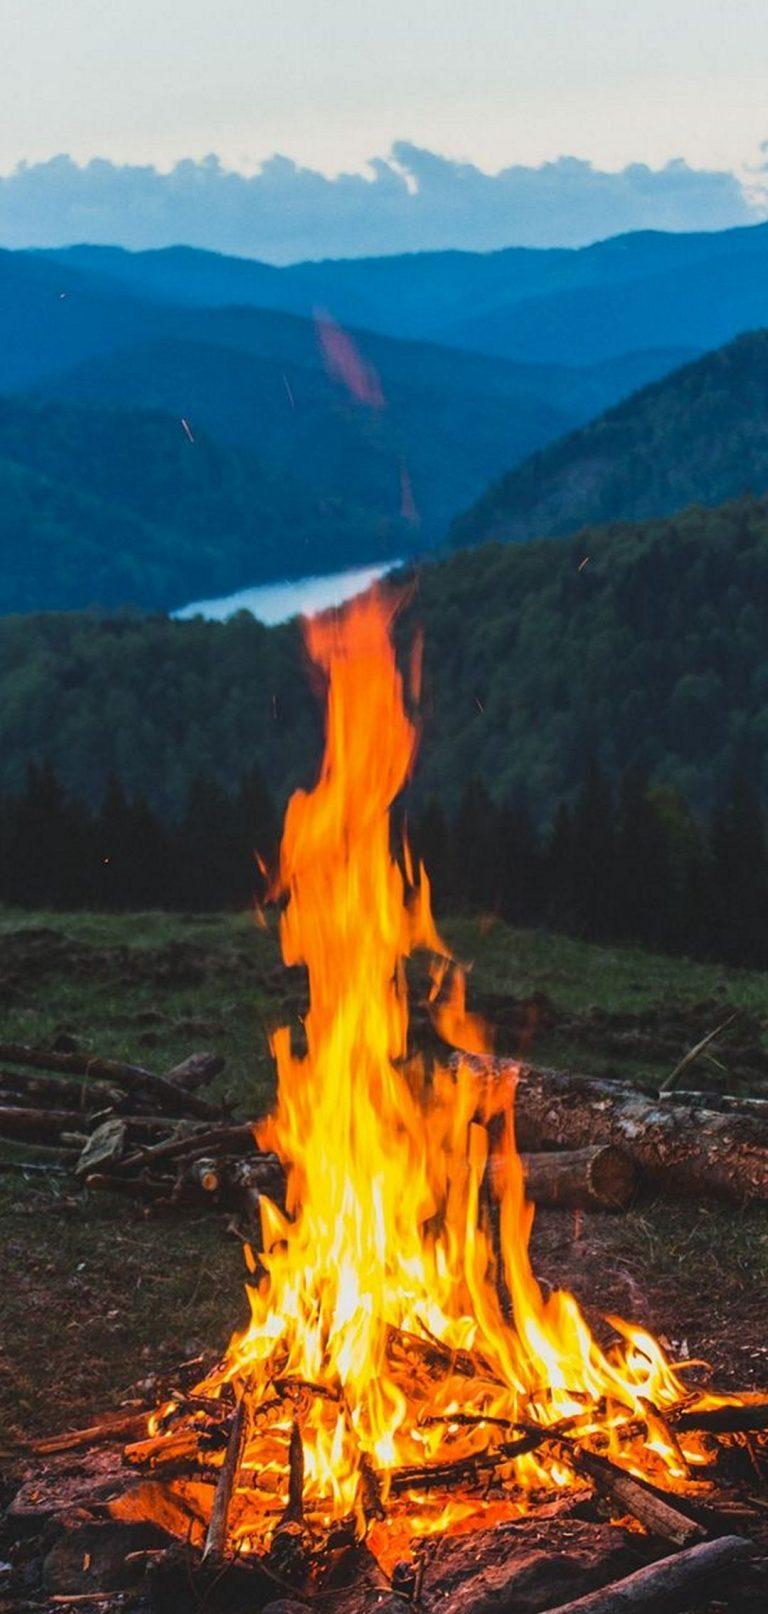 FireWood Campfire Mountain 1080x2270 768x1614